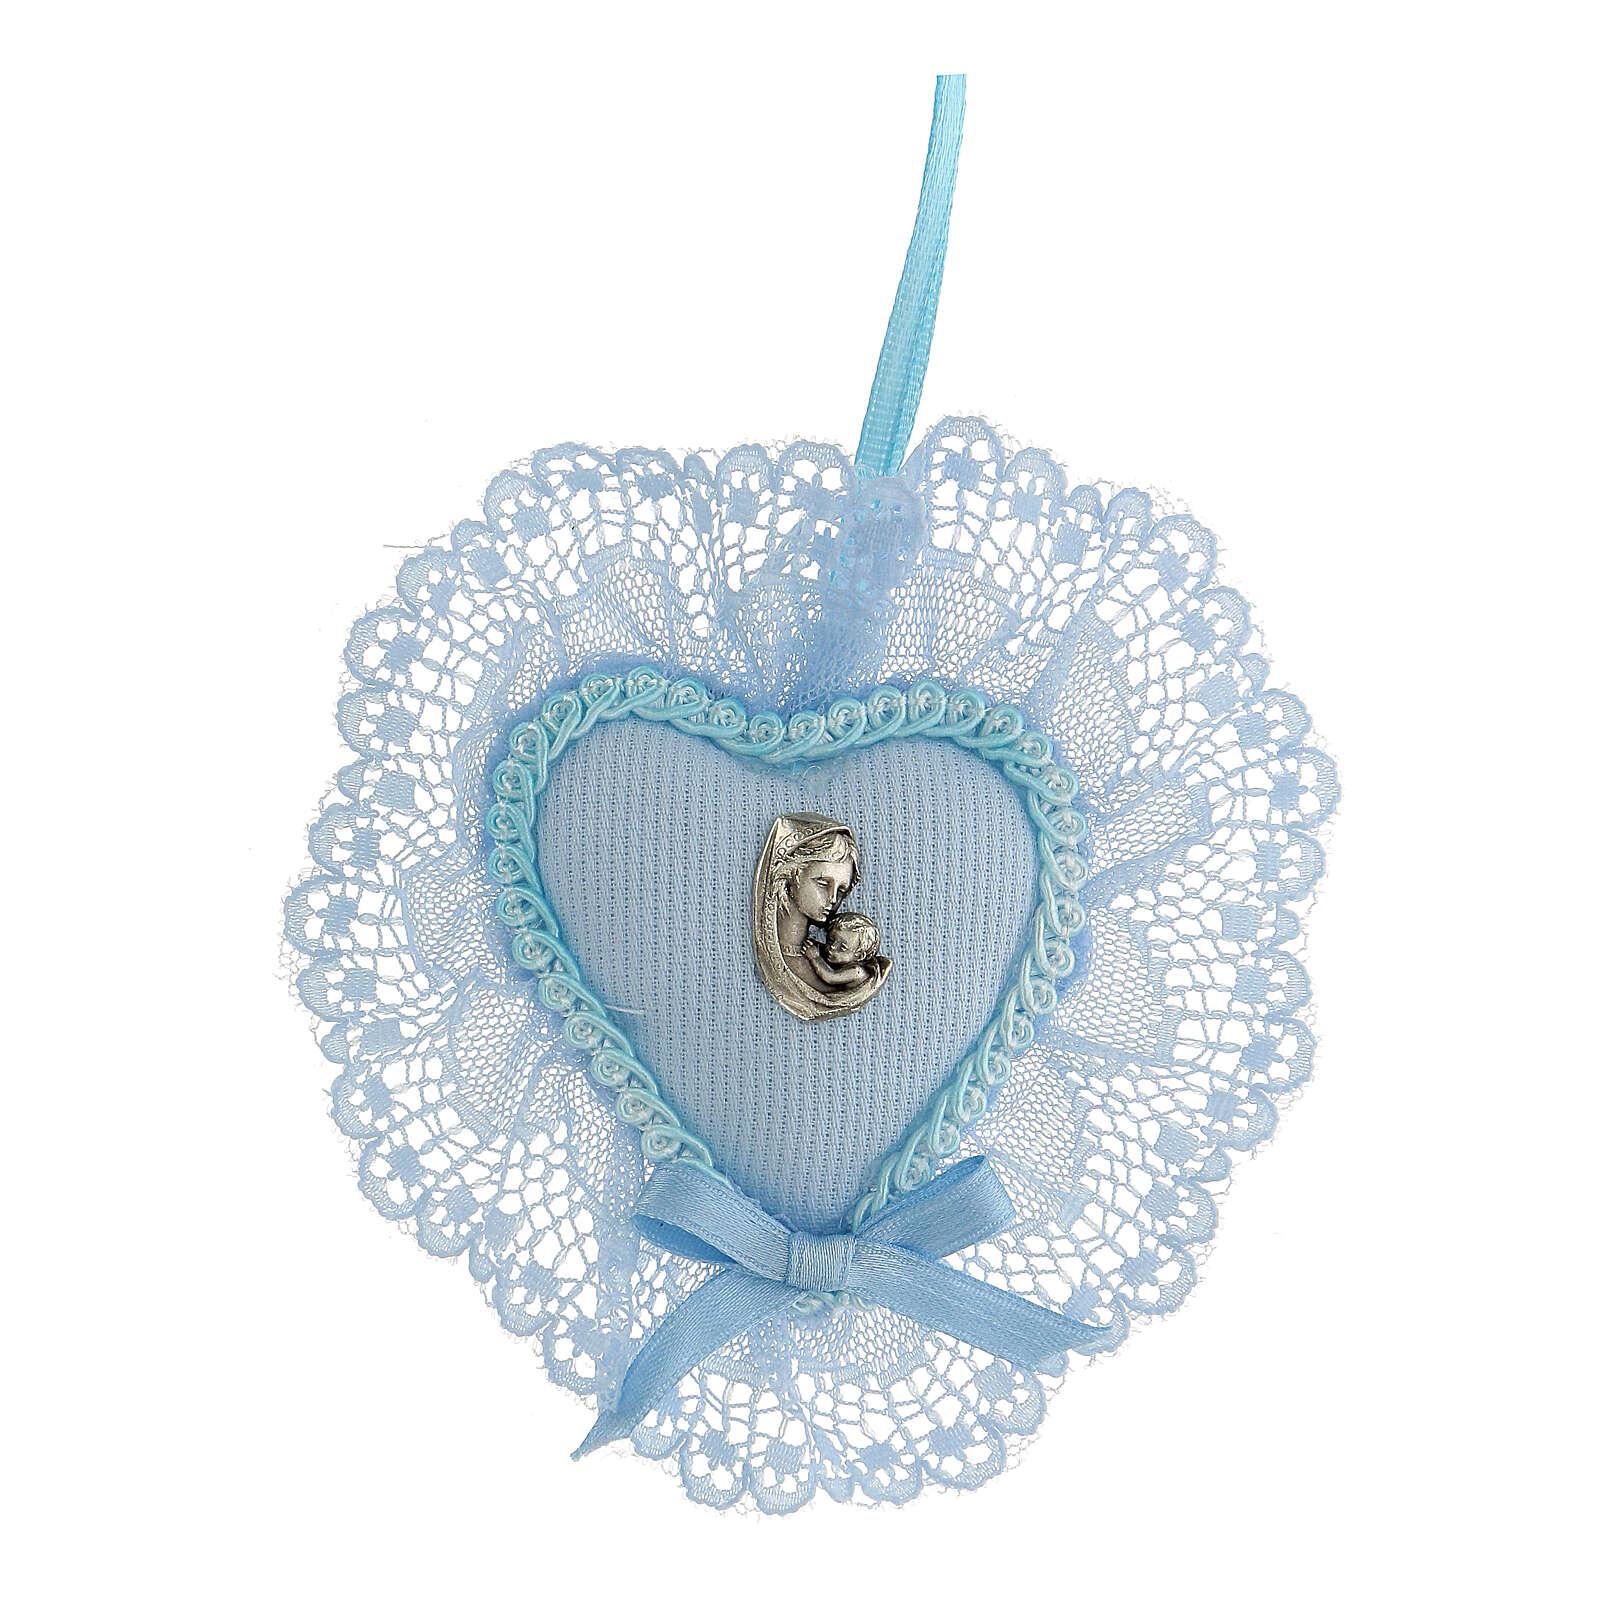 Maternidad escarapela azul cuna 4